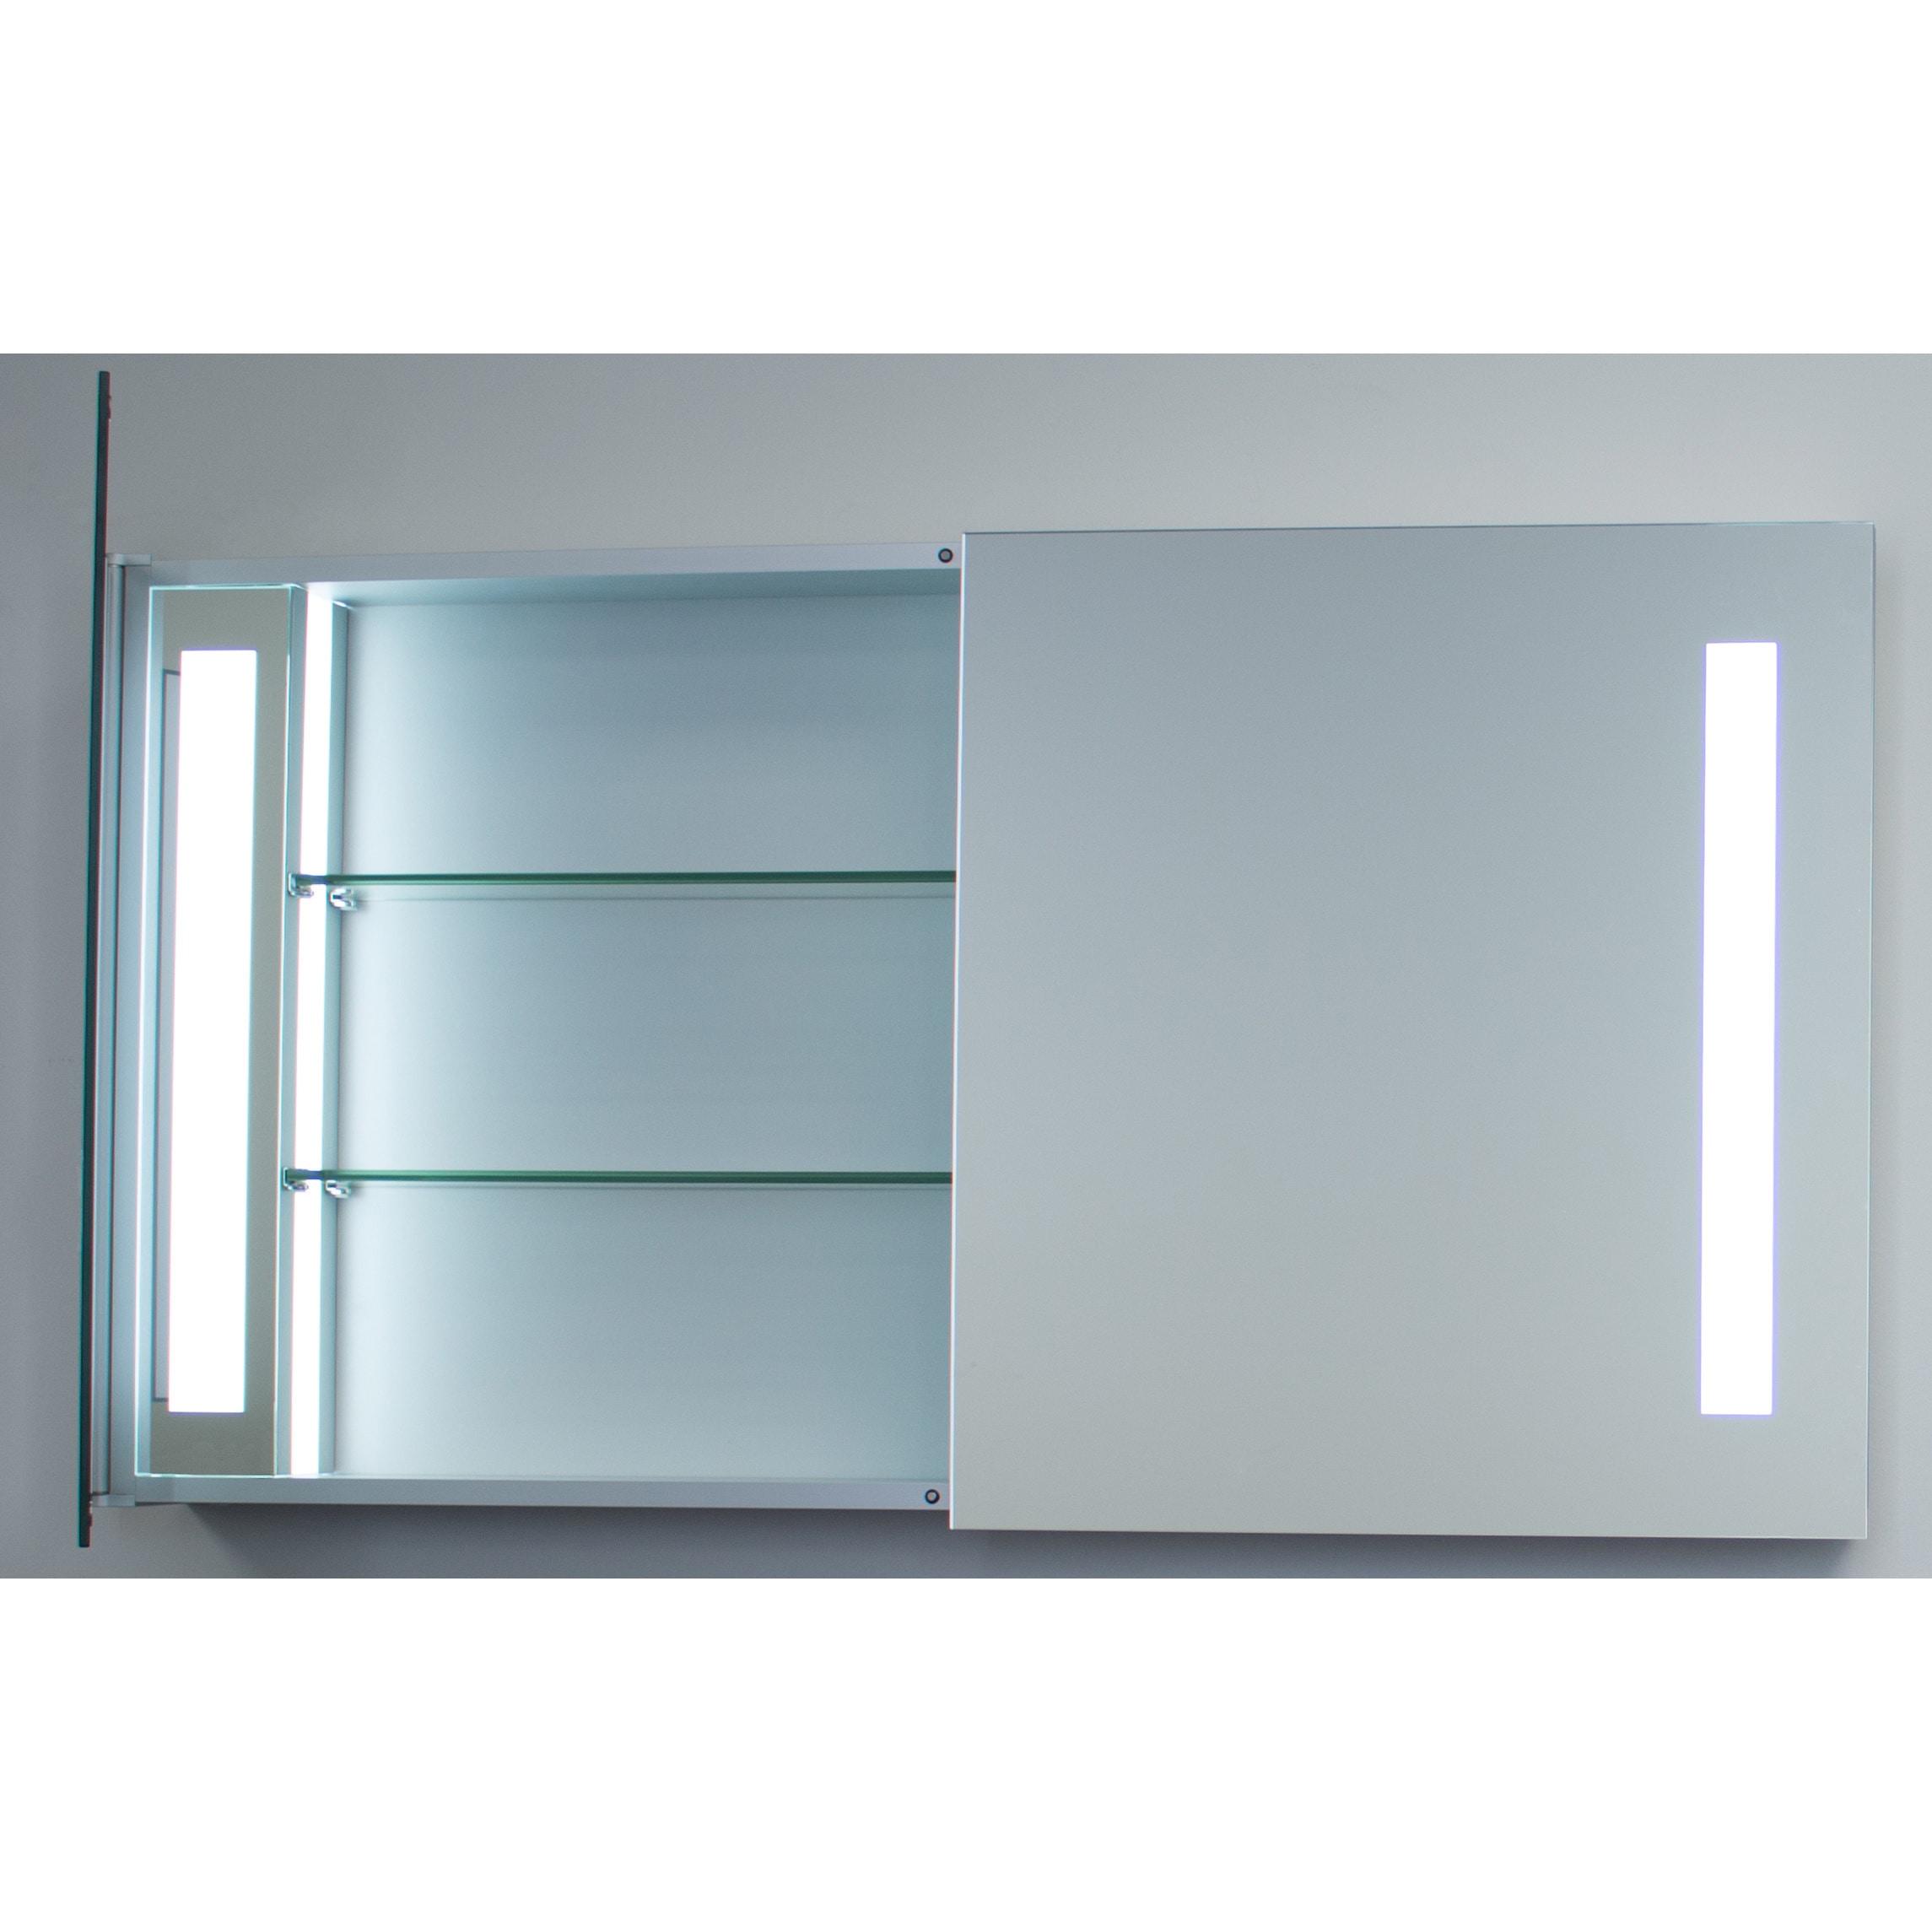 Shop Innoci-USA Zeus LED Double Door Wall Mount Mirrored Lighted ...